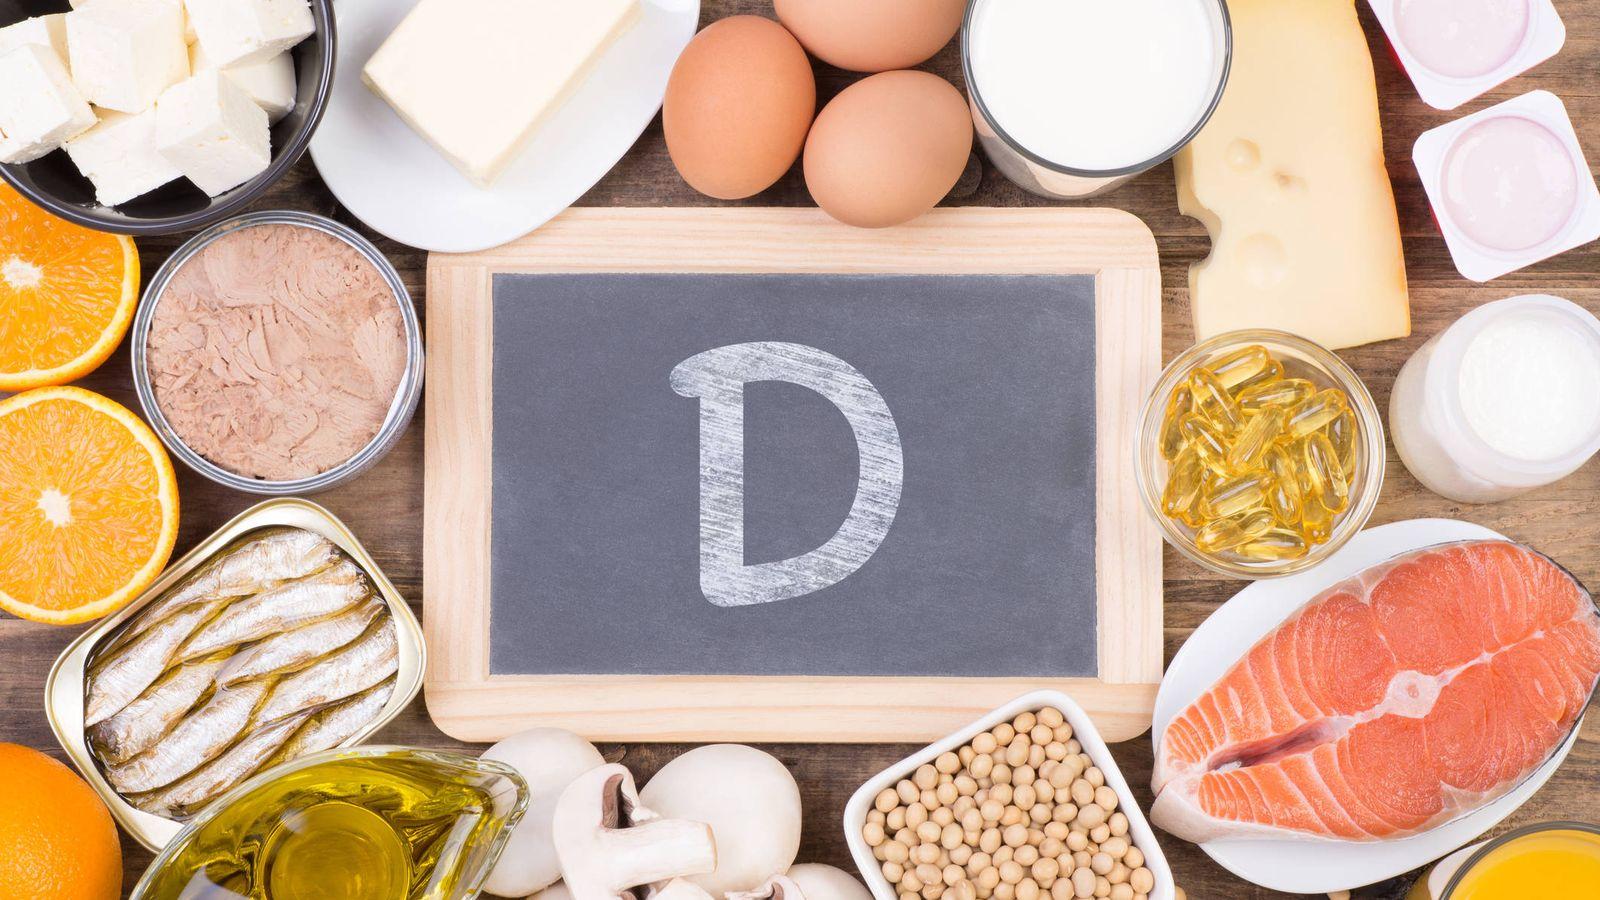 Foto: Food rich in vitamine D